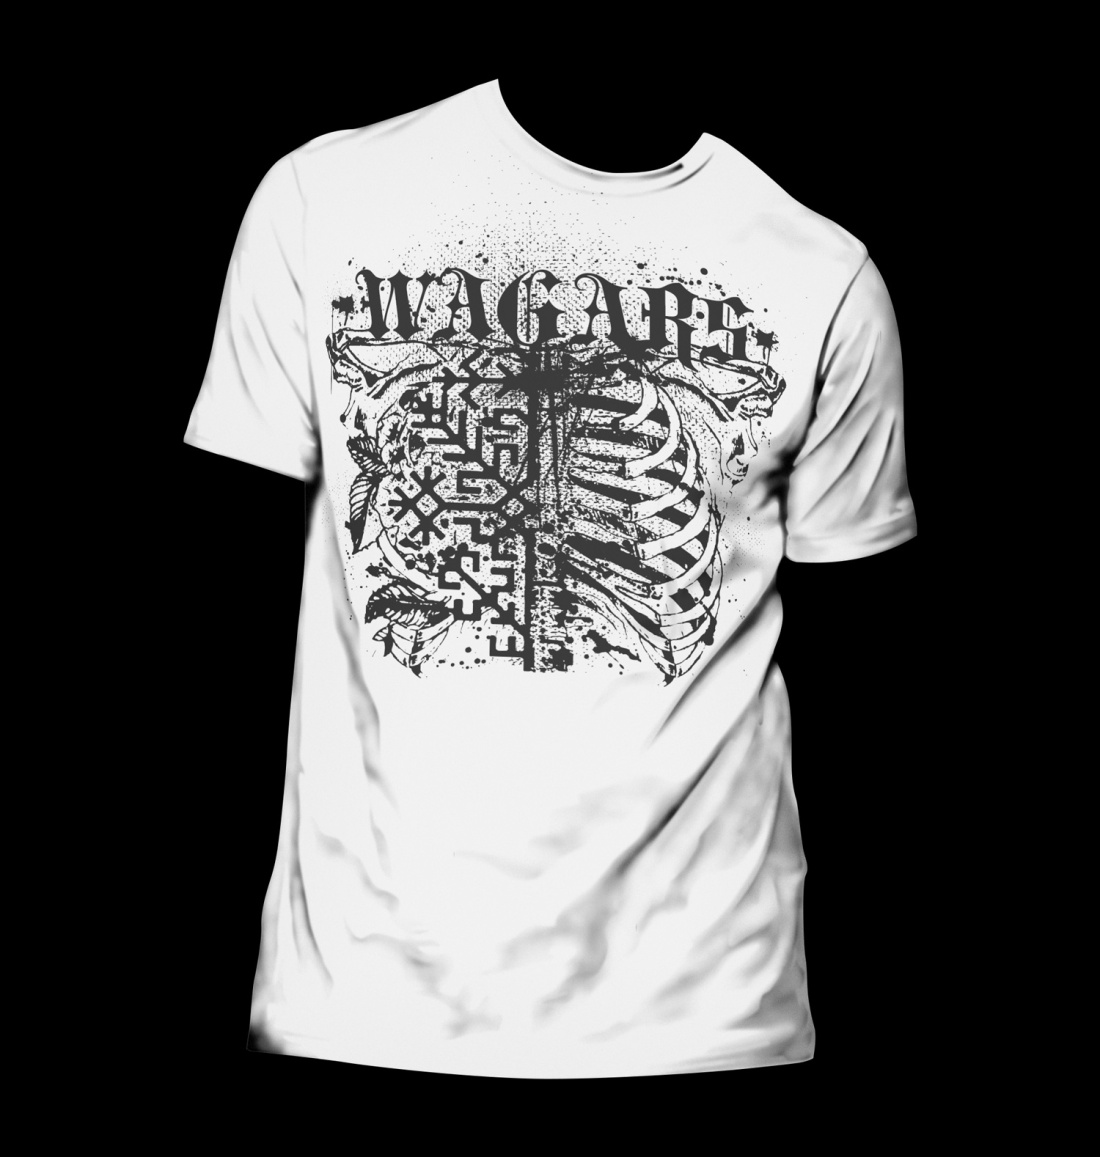 JekabsonsDotCom_WAGARS_t-shirt_skeleton_SidrabenesLasts